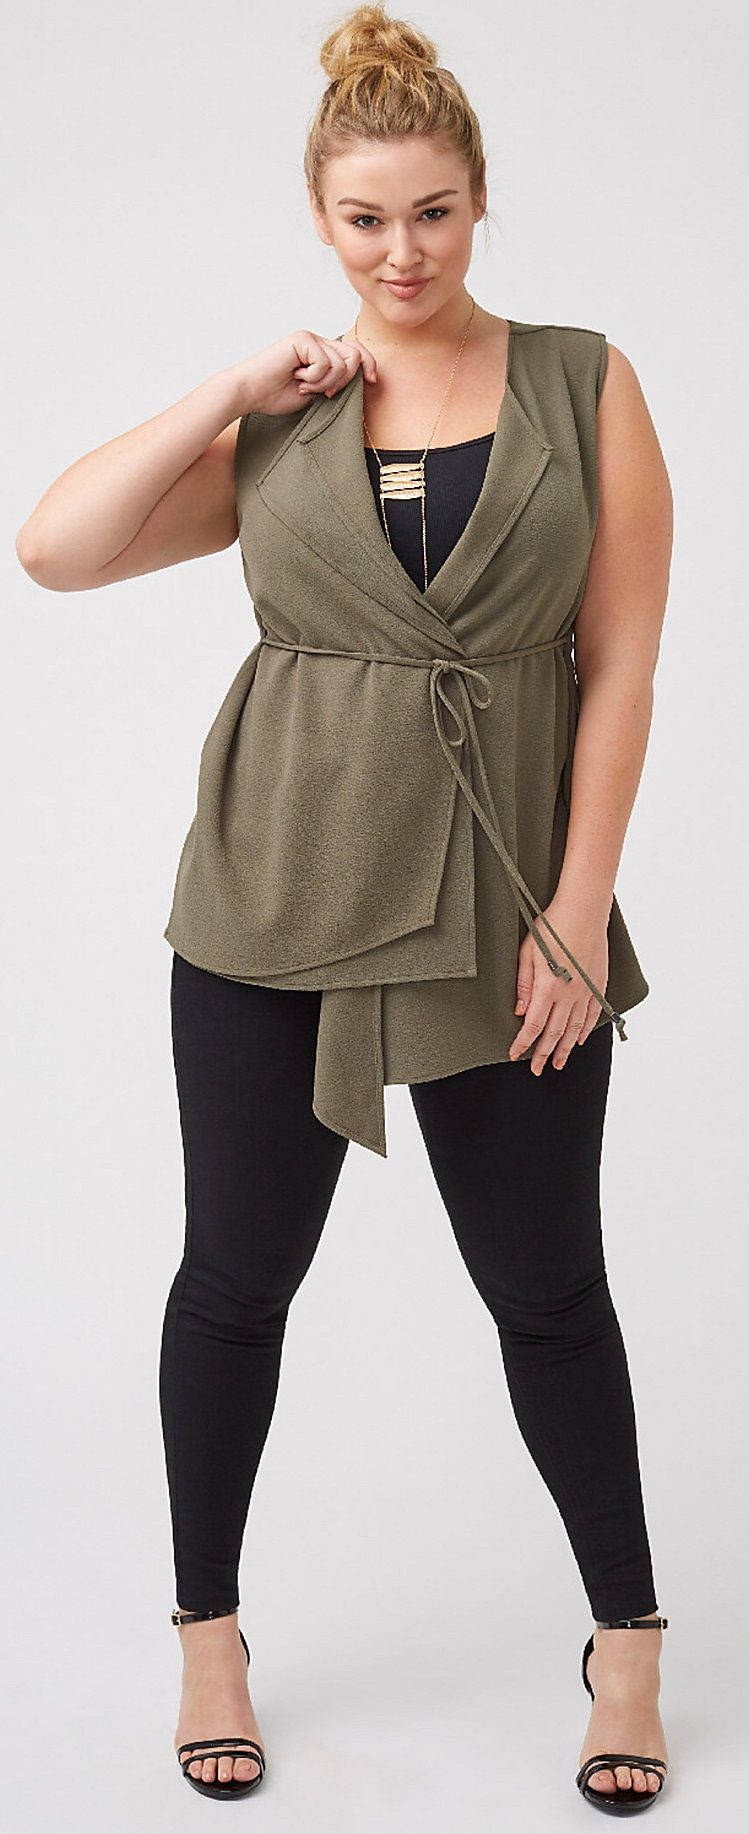 Usa blusa cruzada o vestido para que tu cintura se vea mas pequeña